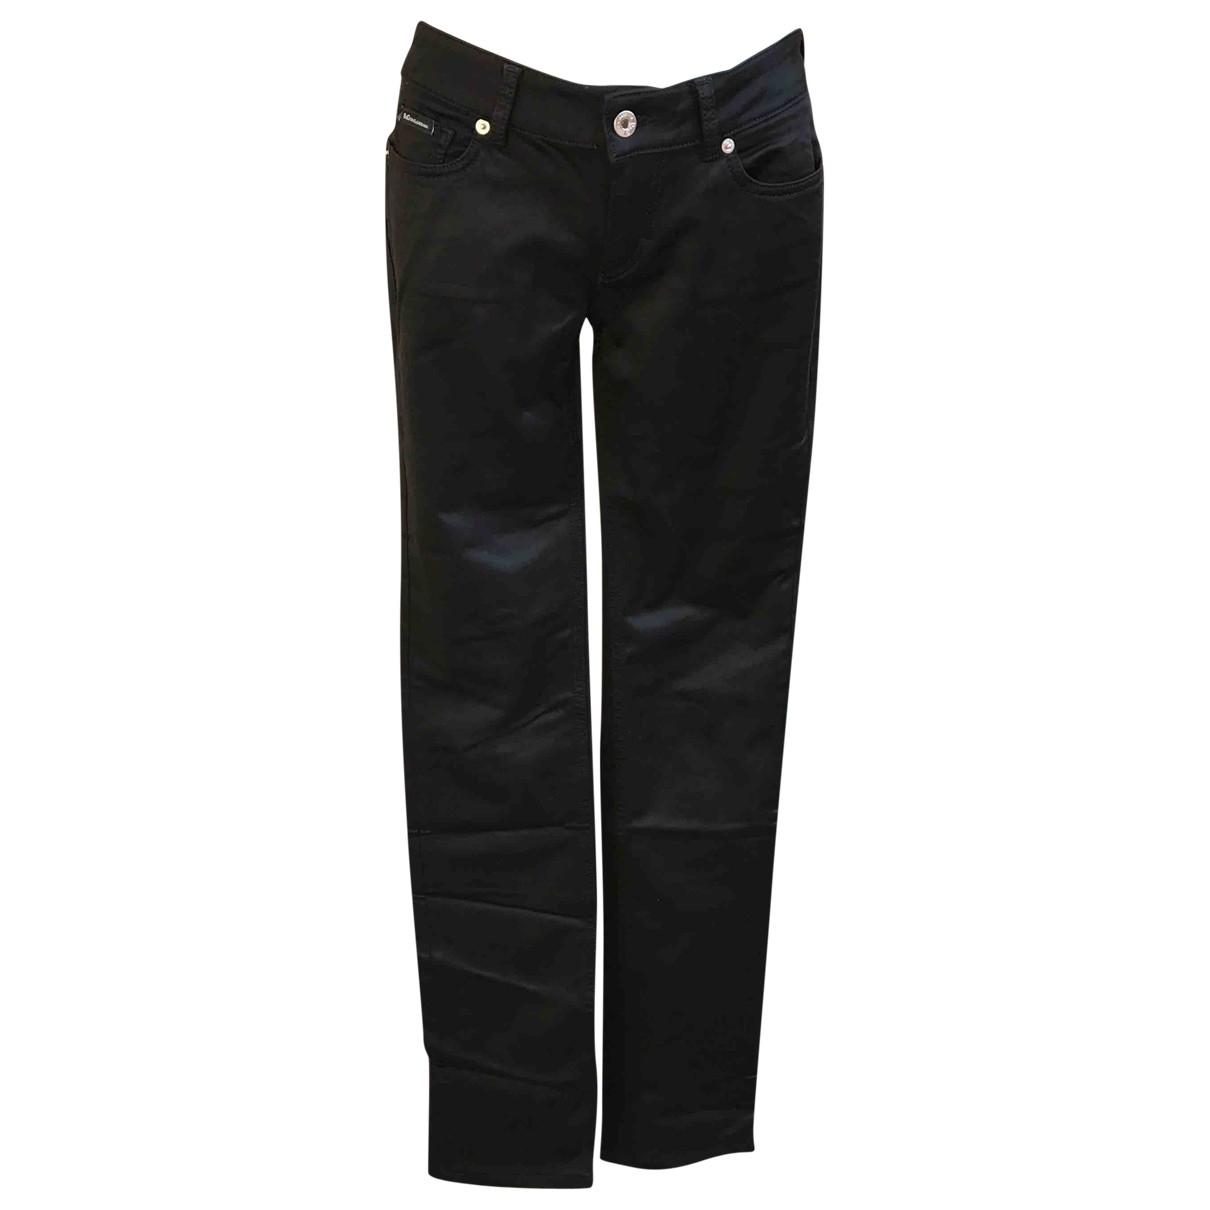 D&g \N Black Cotton Trousers for Women 40 IT